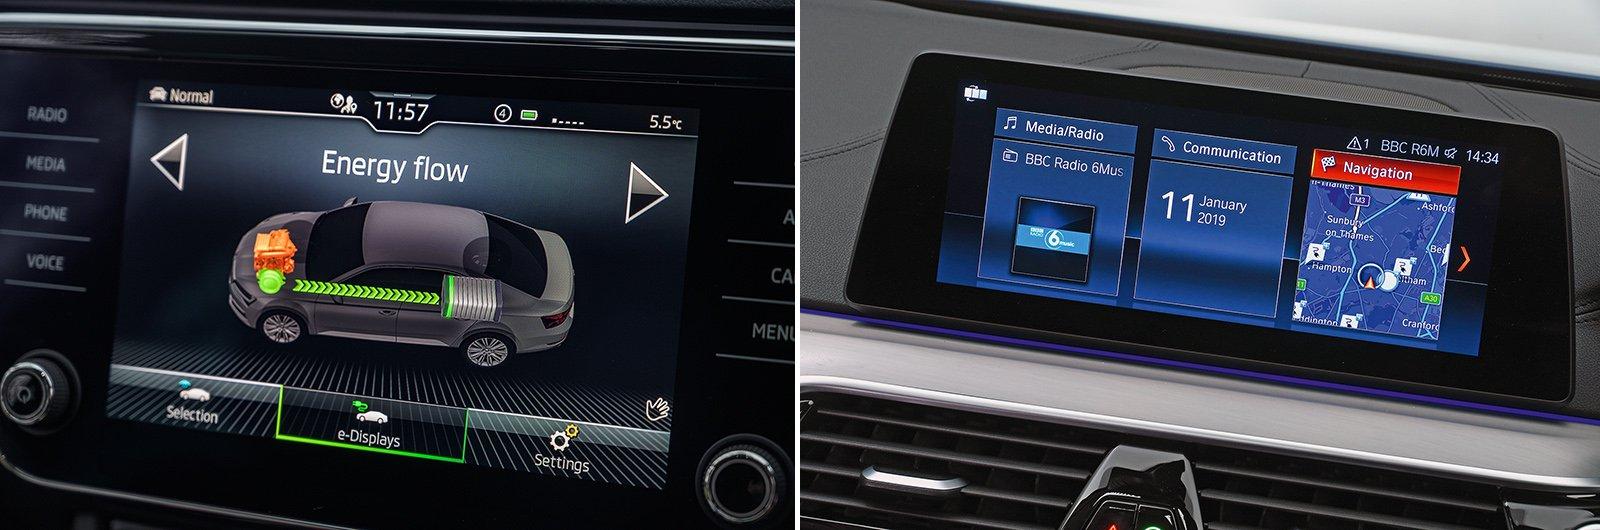 New Skoda Superb iV vs used BMW 530e: – infotainment